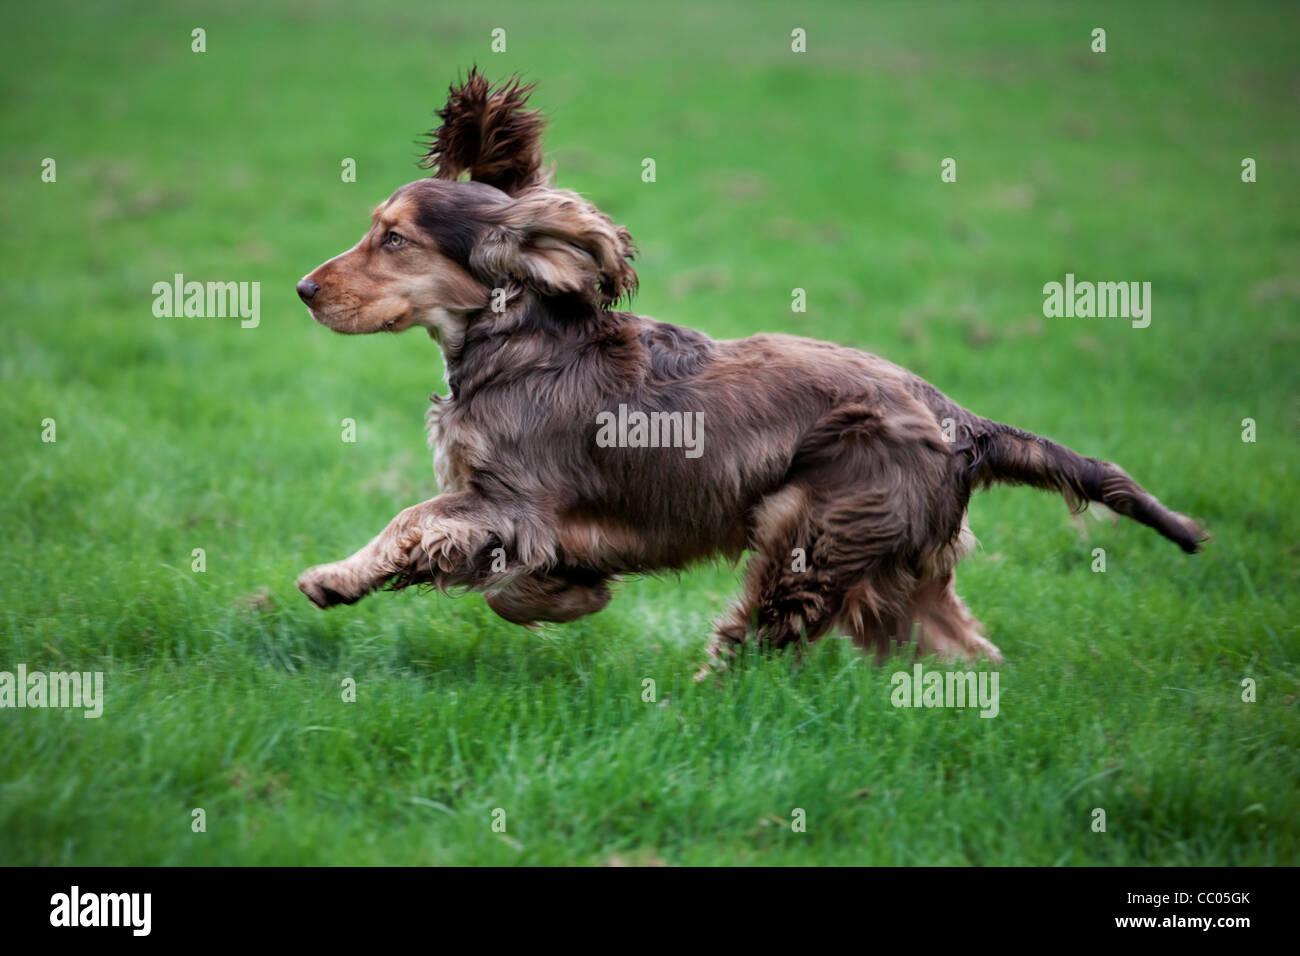 English Cocker Spaniel running in garden - Stock Image